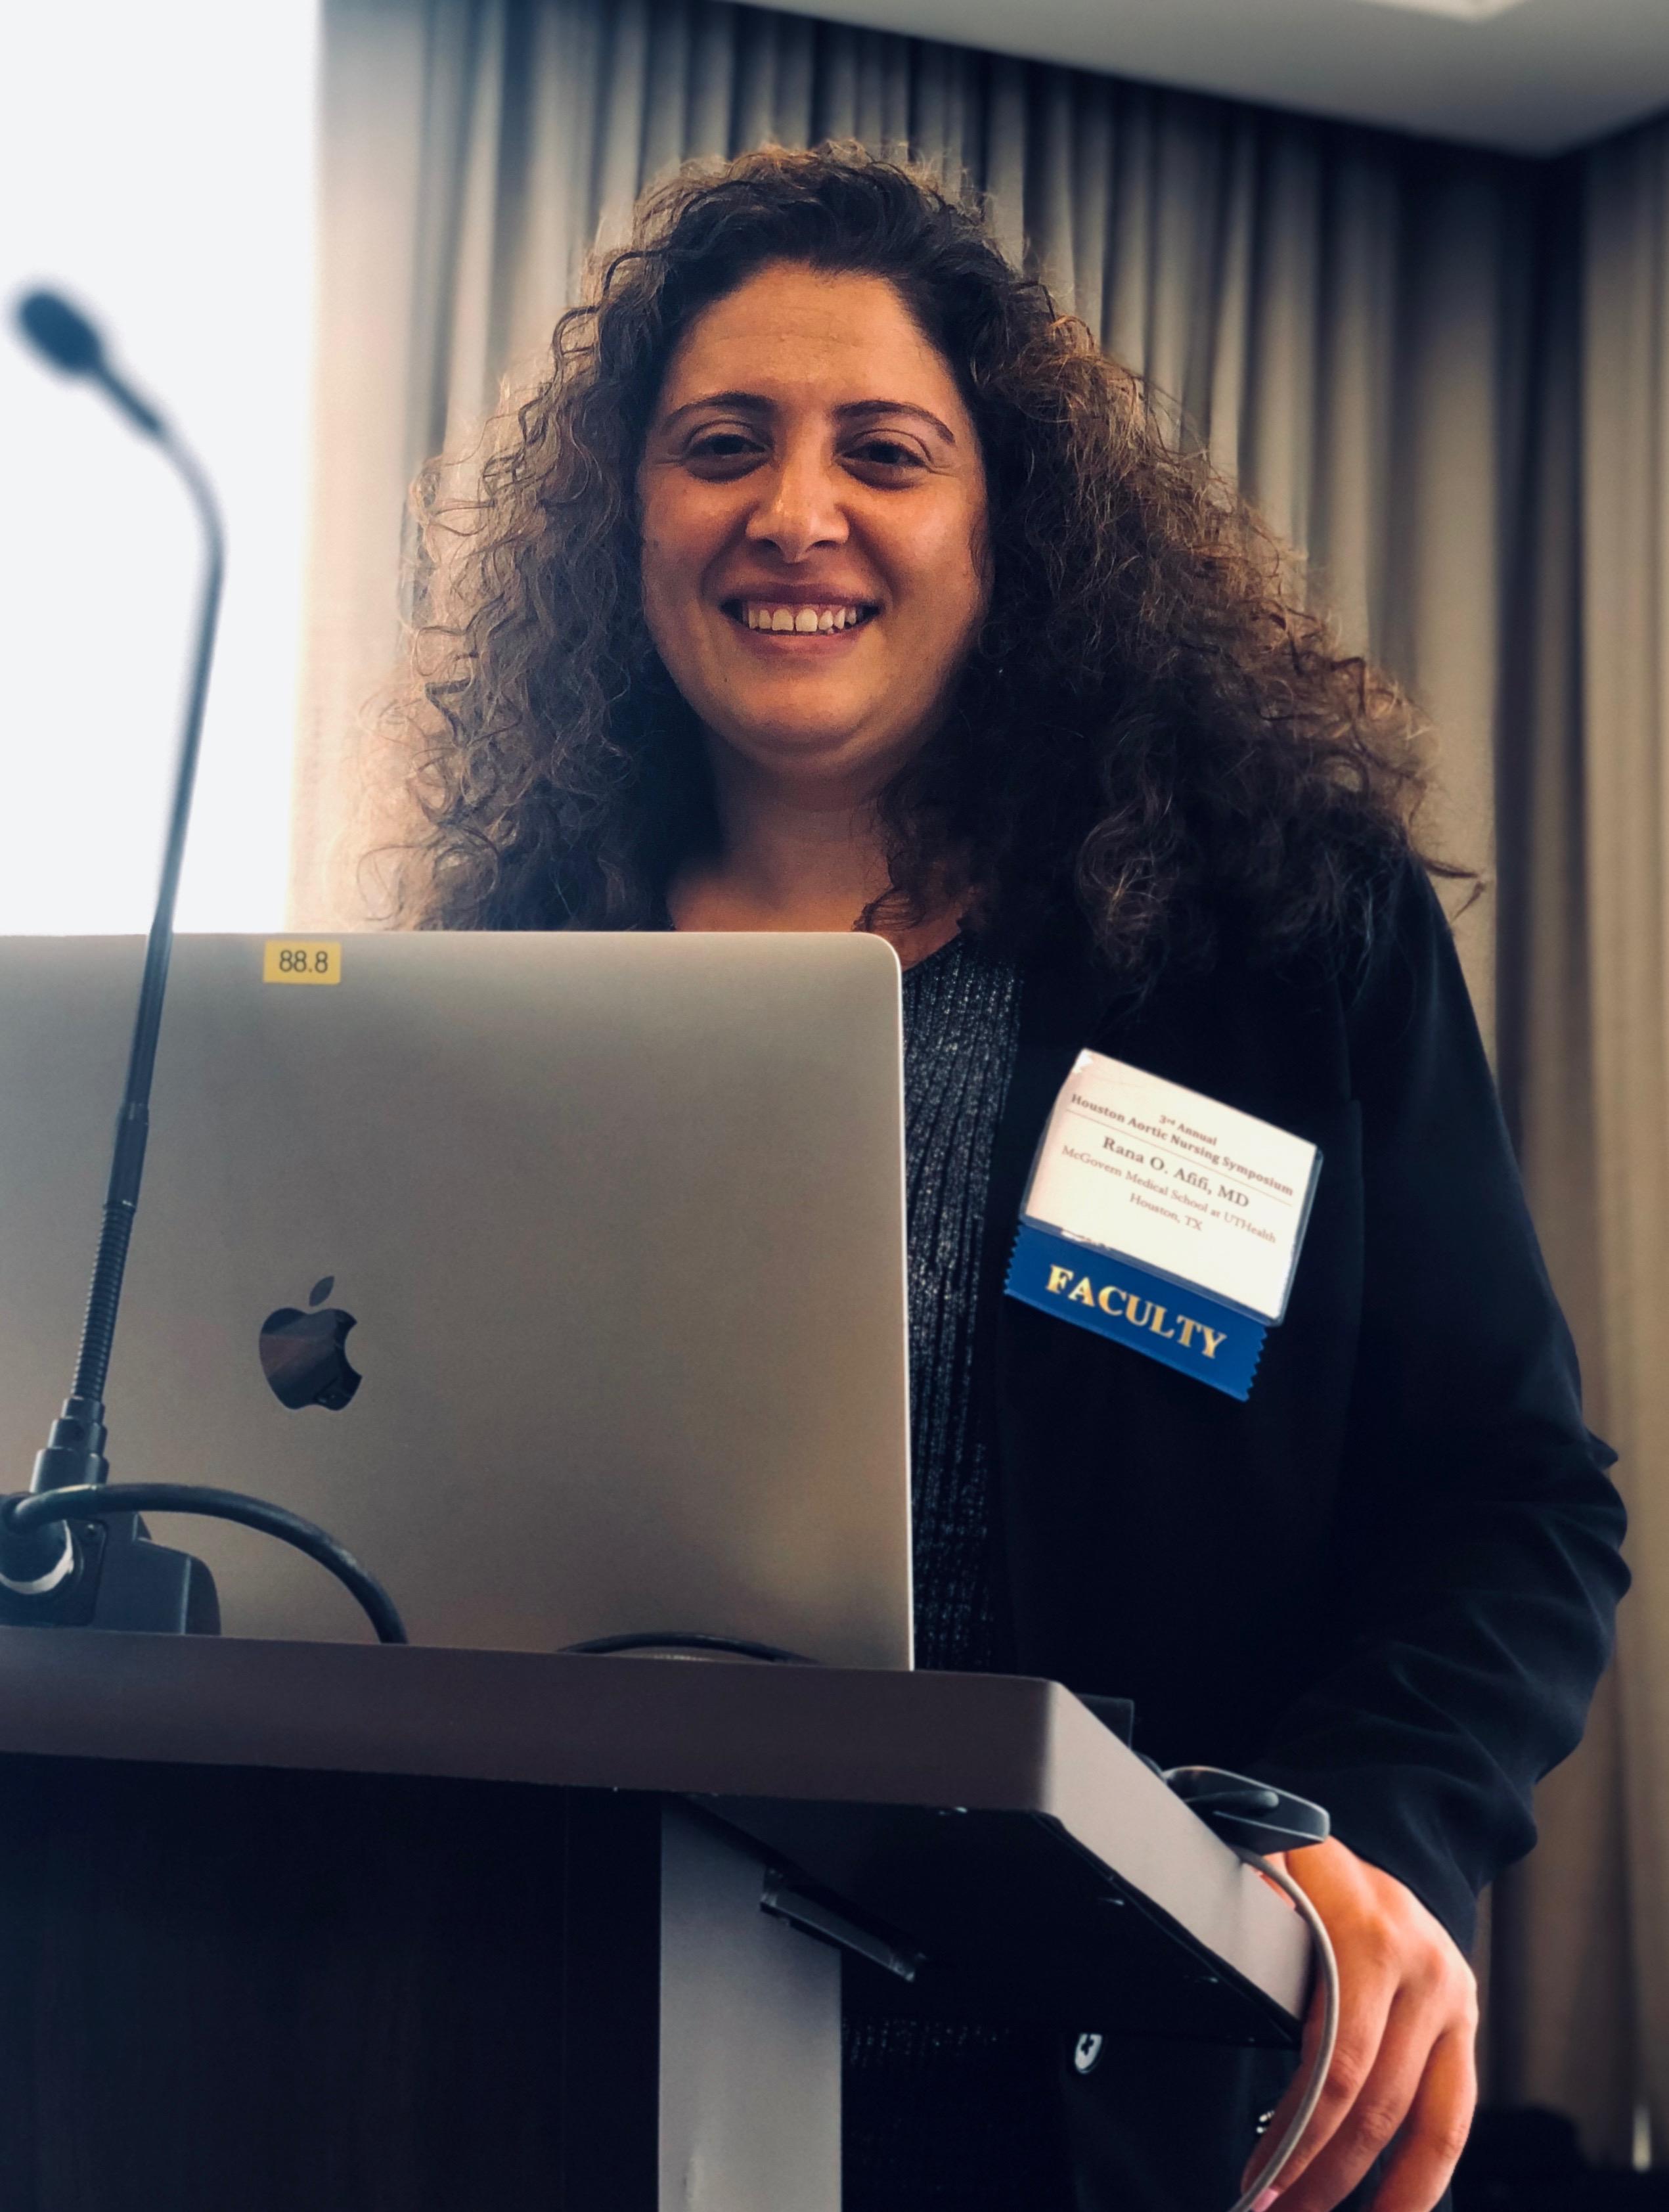 Dr. Rana afifi smiling at podium